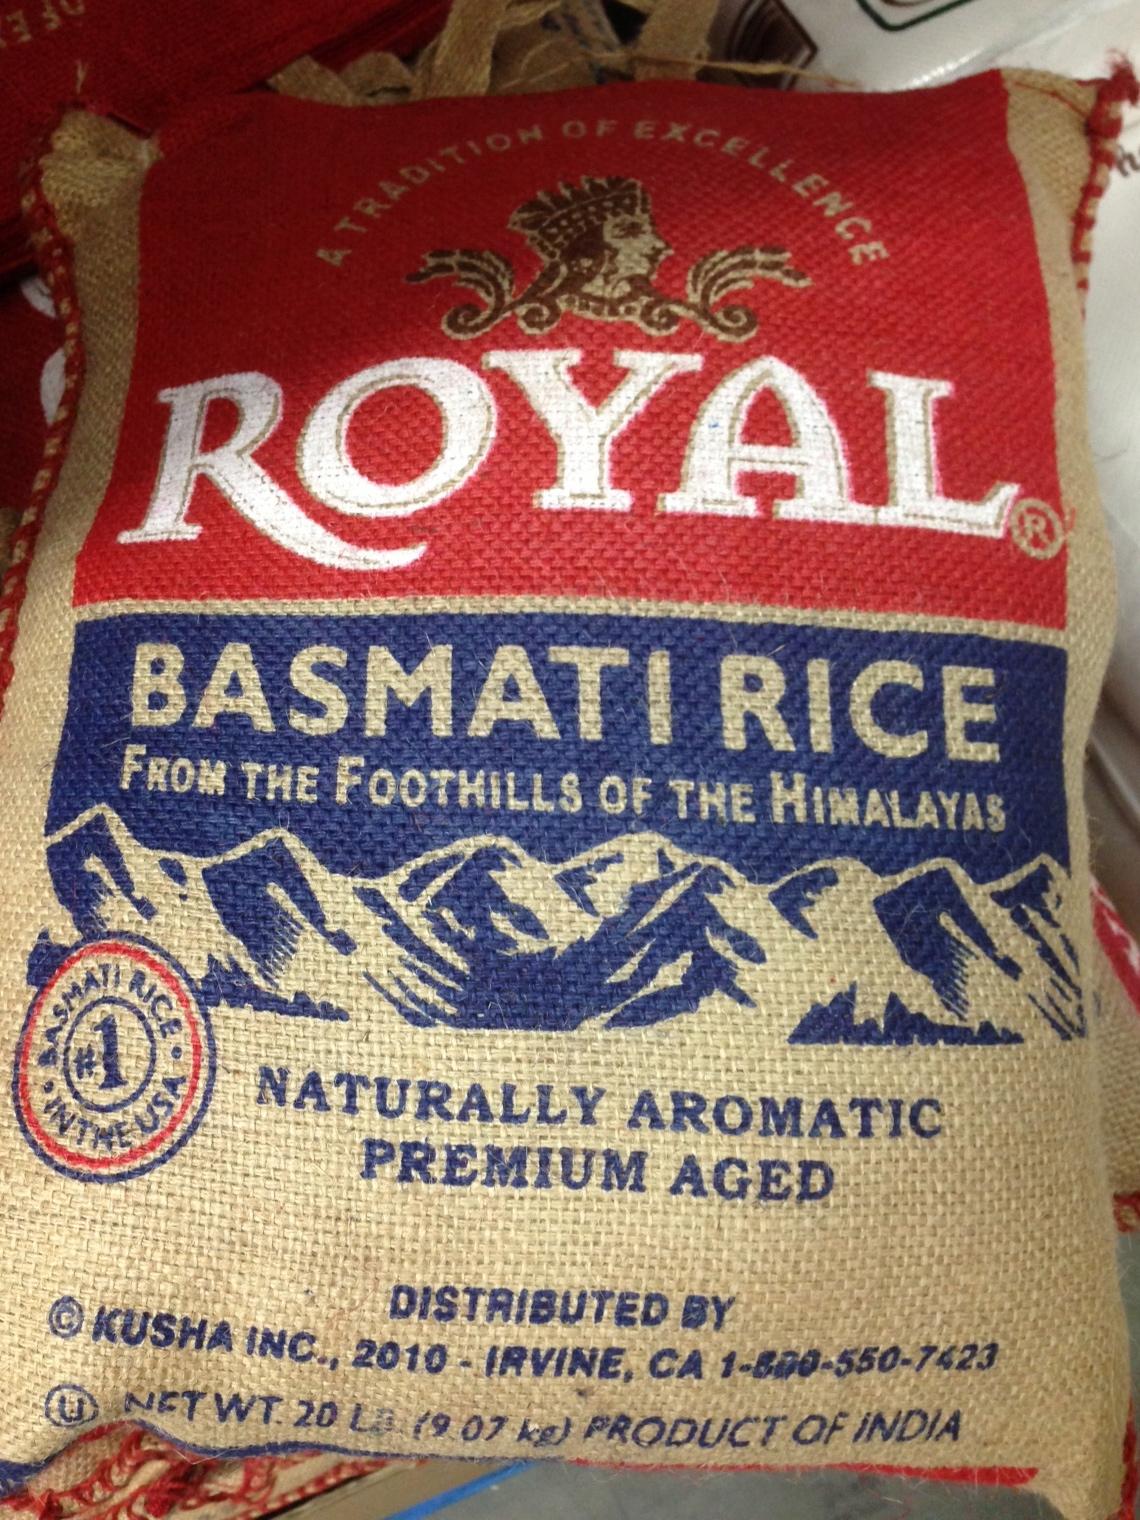 india / basmati rice